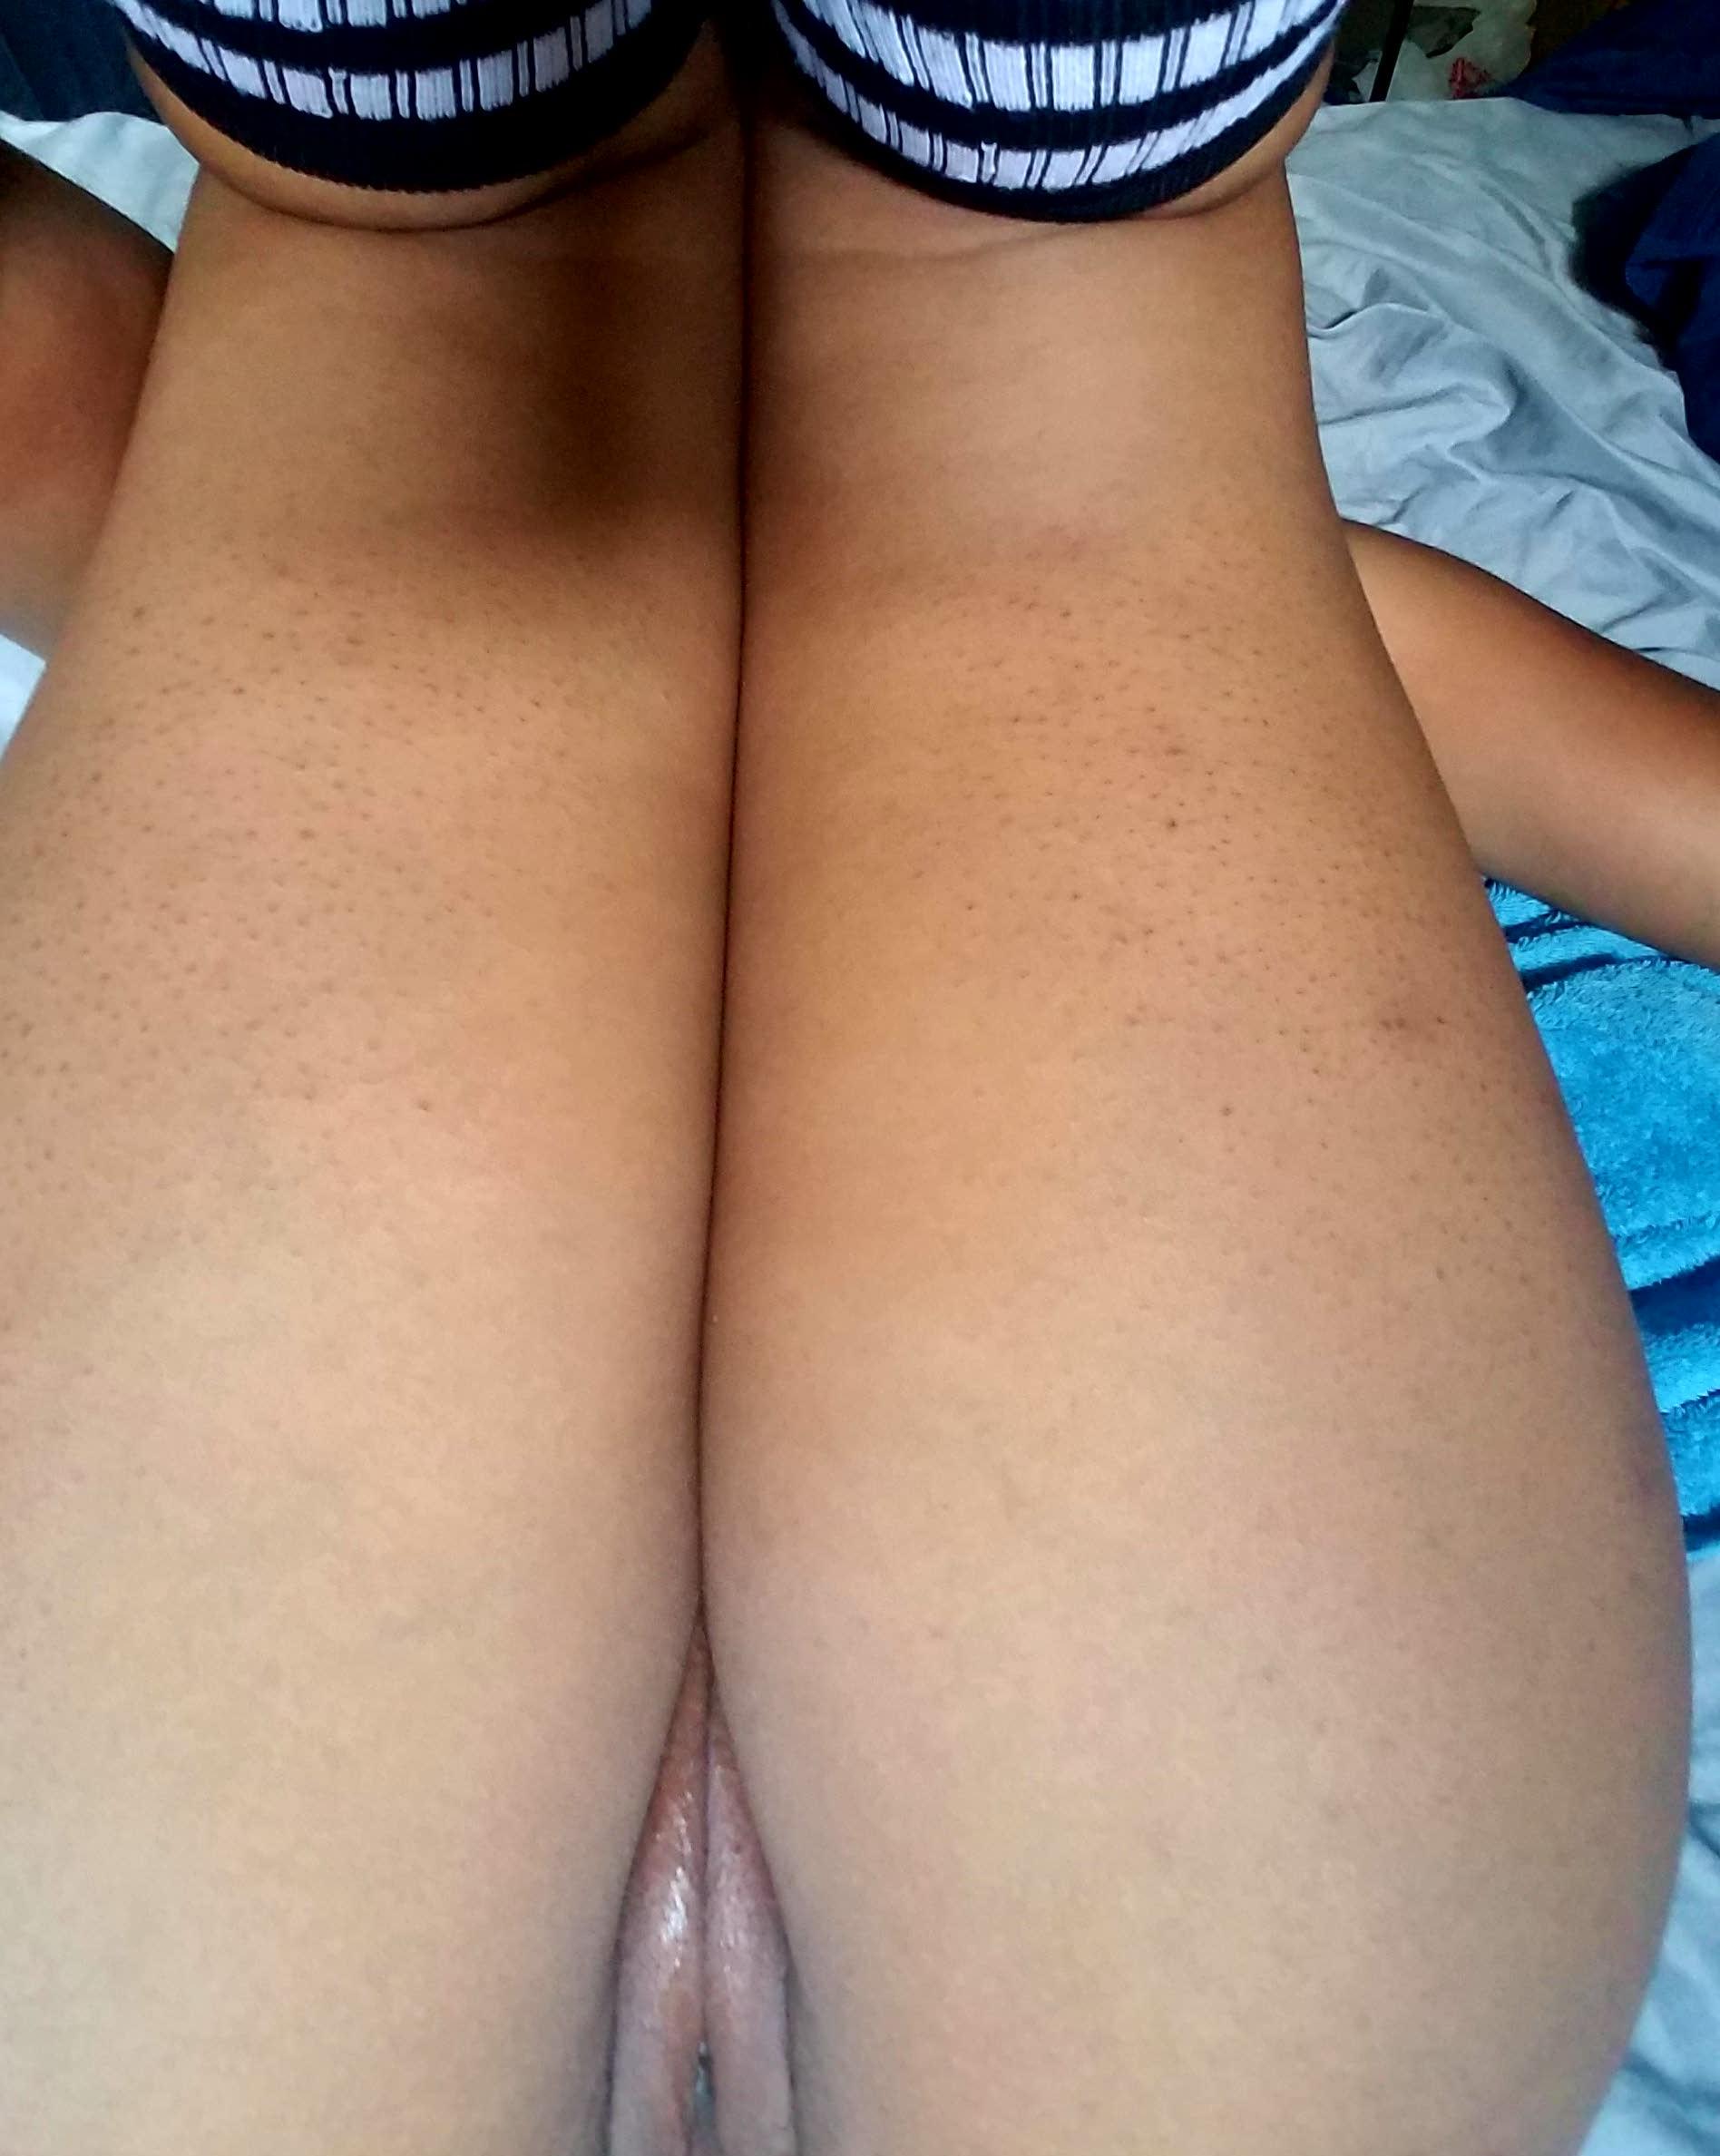 Mound pussy 8 Vulva